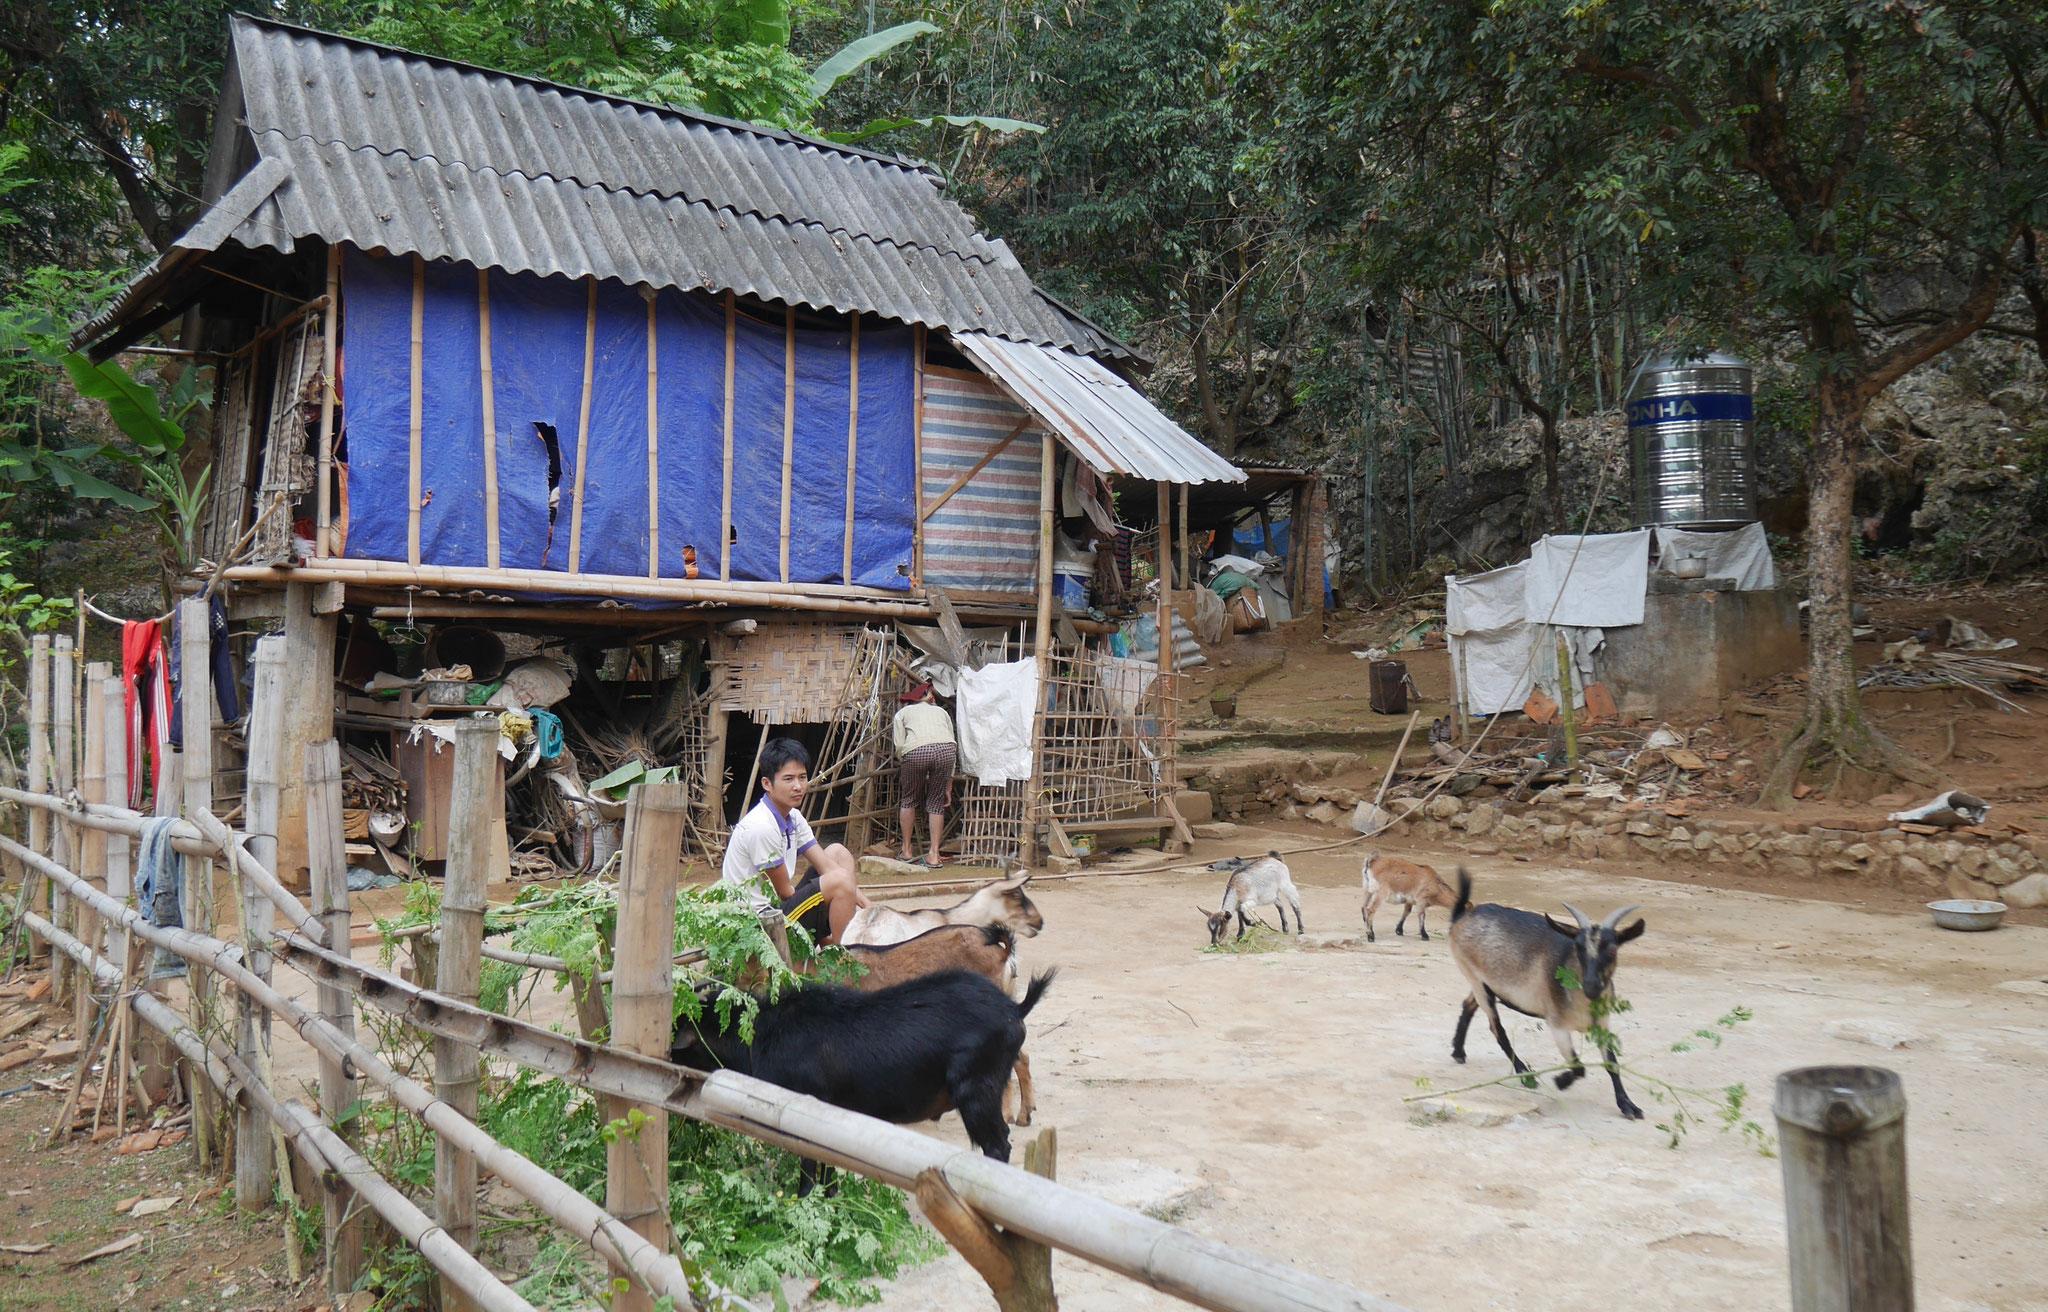 Radtour durch die Reisfelder Mai Chau